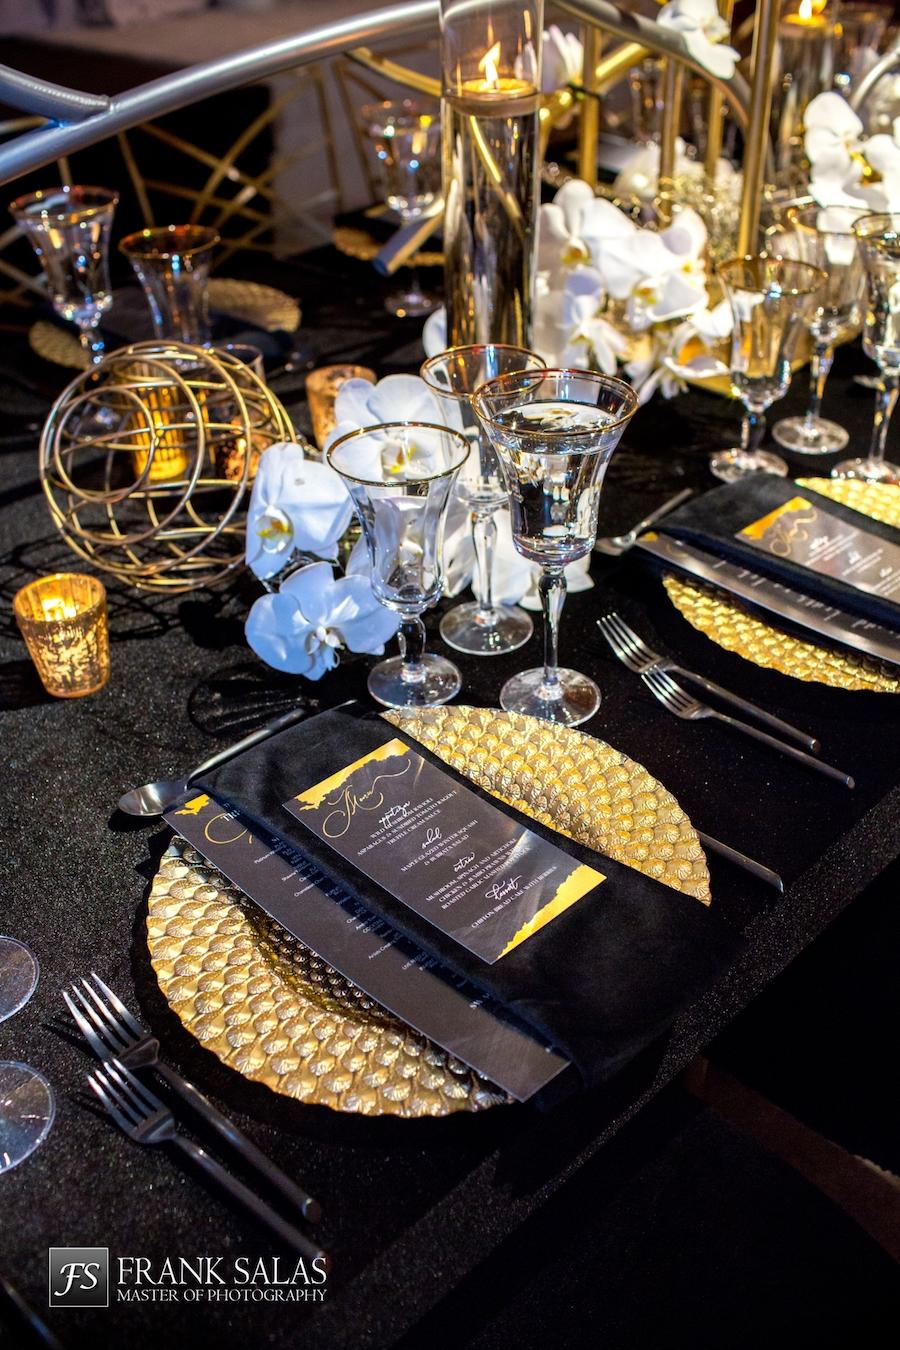 ABC Gala 2017-Shawna-yamamoto-kelsey-events-pasea-hotel-platinum-weddings-by-Kerrie-Frank-Salas-14.jpg